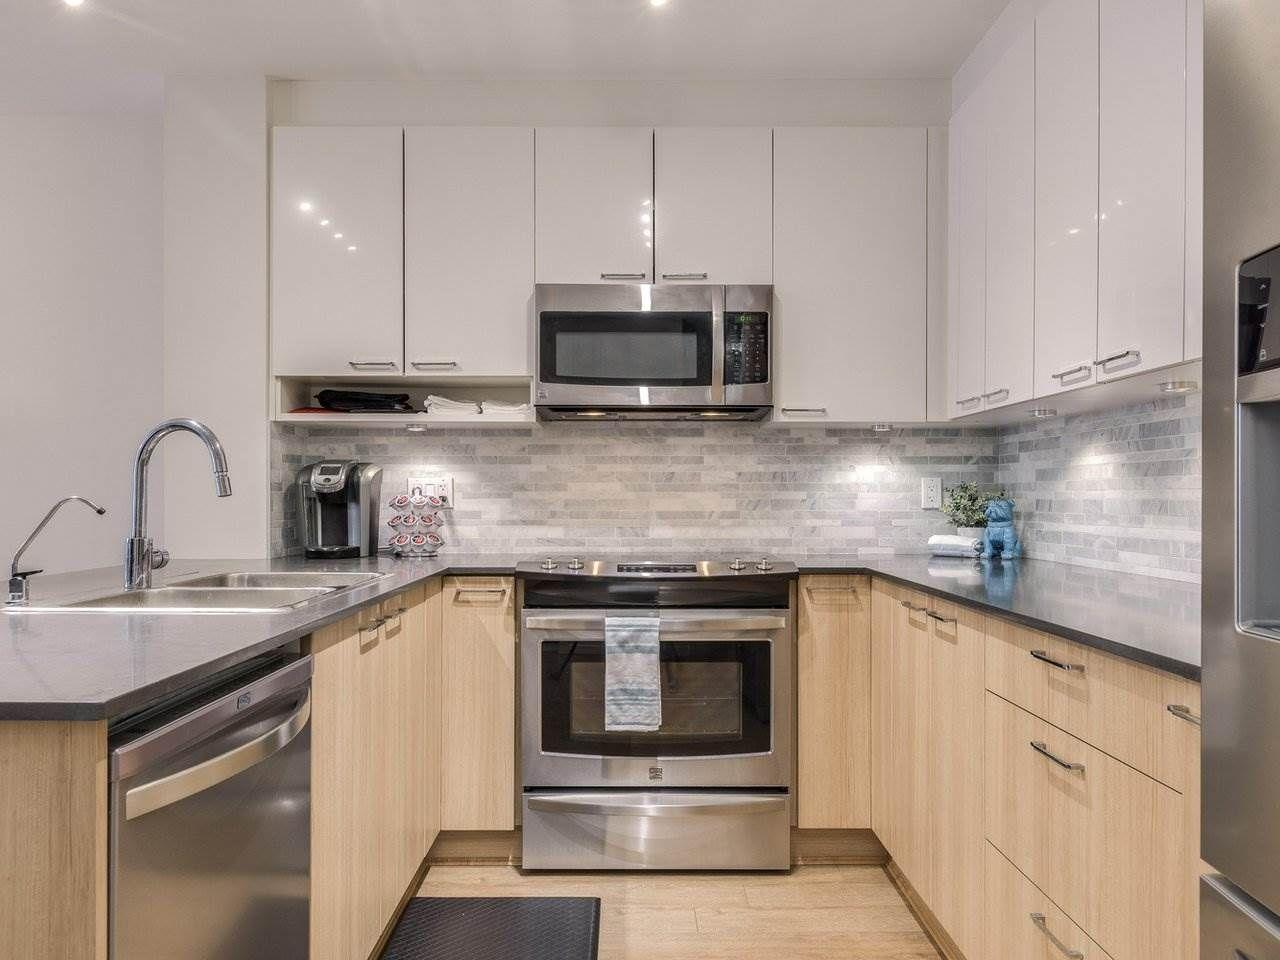 "Main Photo: 302 210 LEBLEU Street in Coquitlam: Maillardville Condo for sale in ""MACKIN PARK"" : MLS®# R2424153"